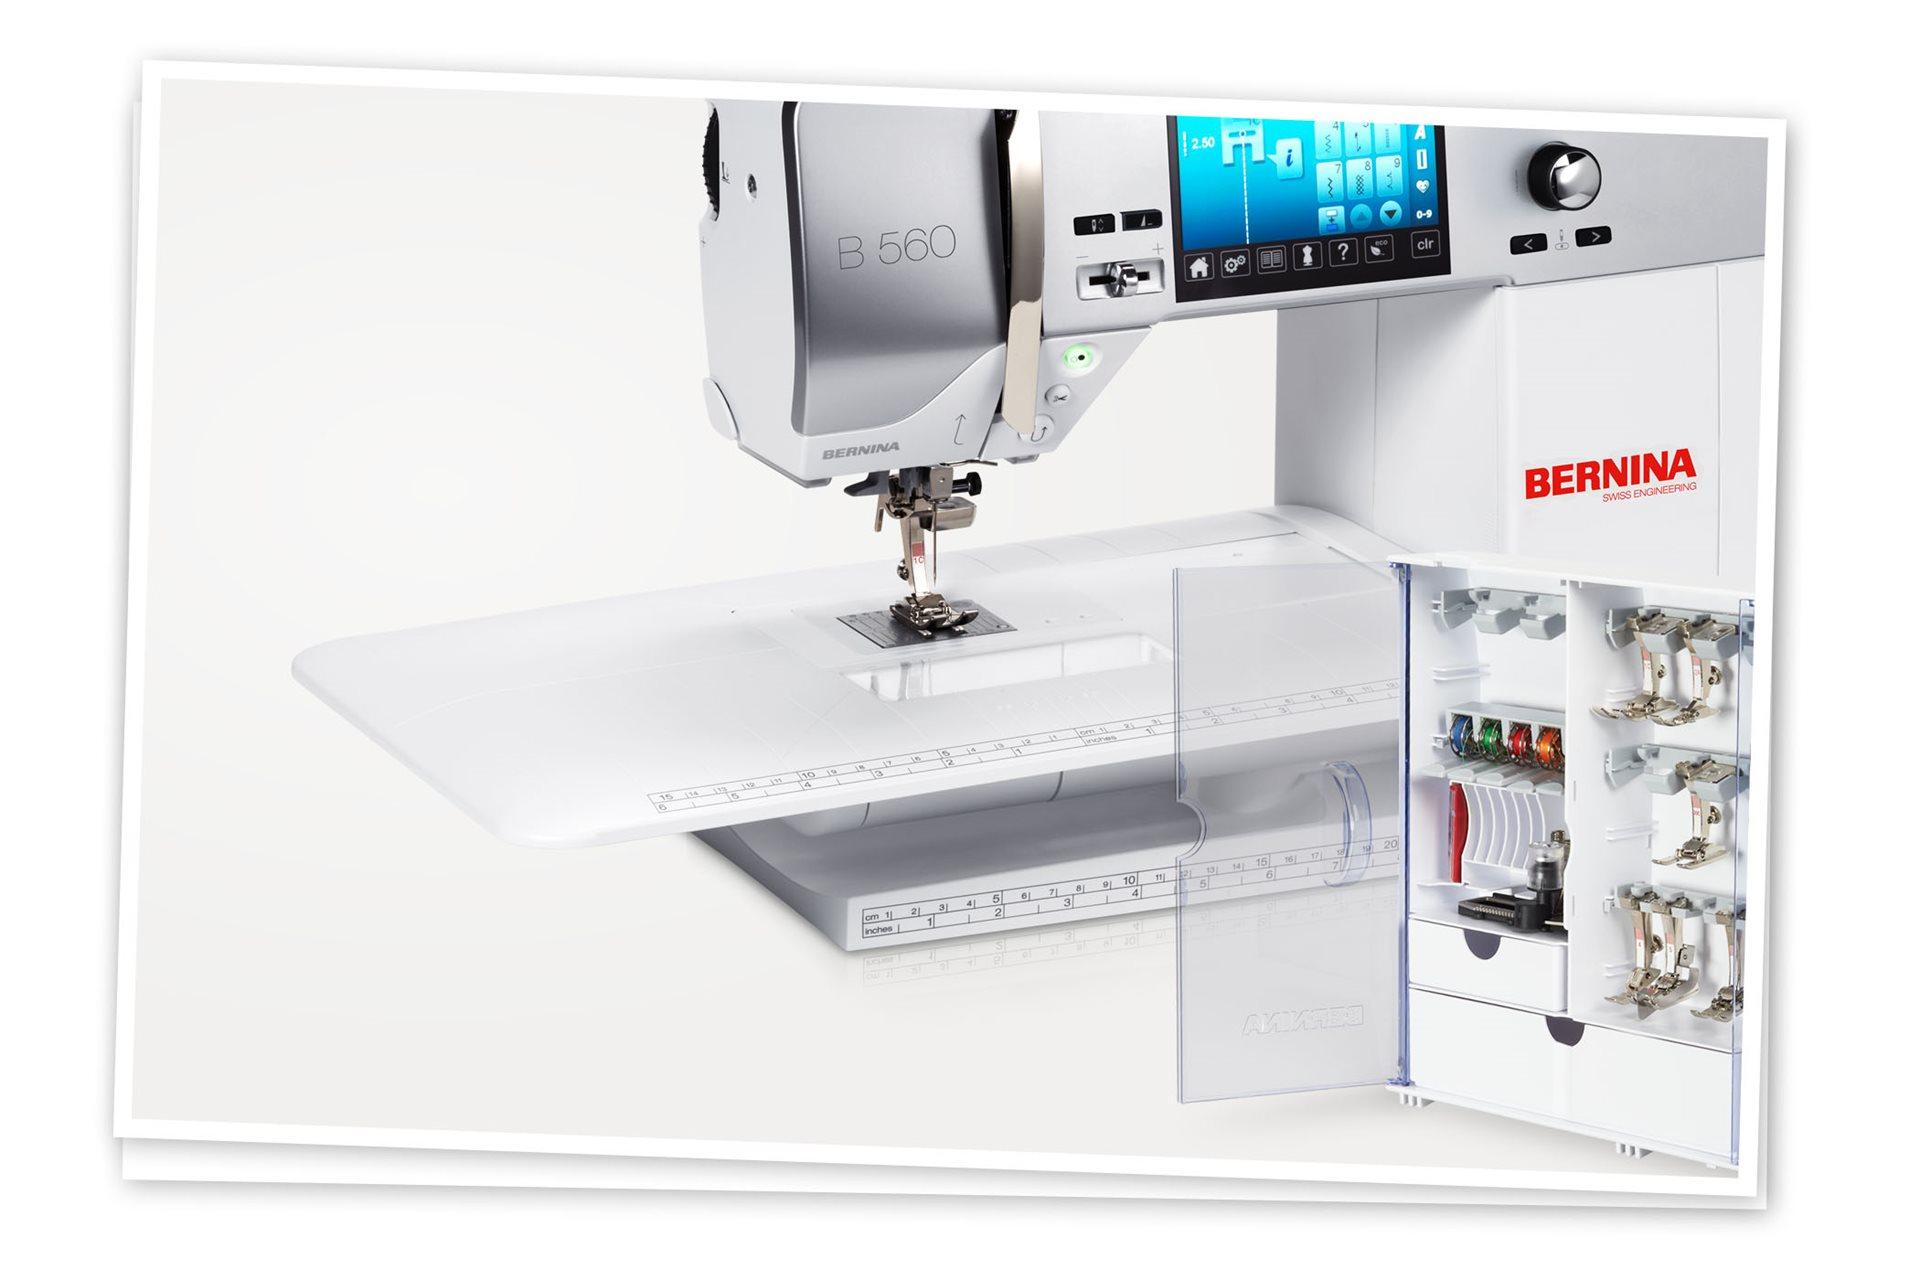 B560 leveres med forlengerbord og tilbehørsboks